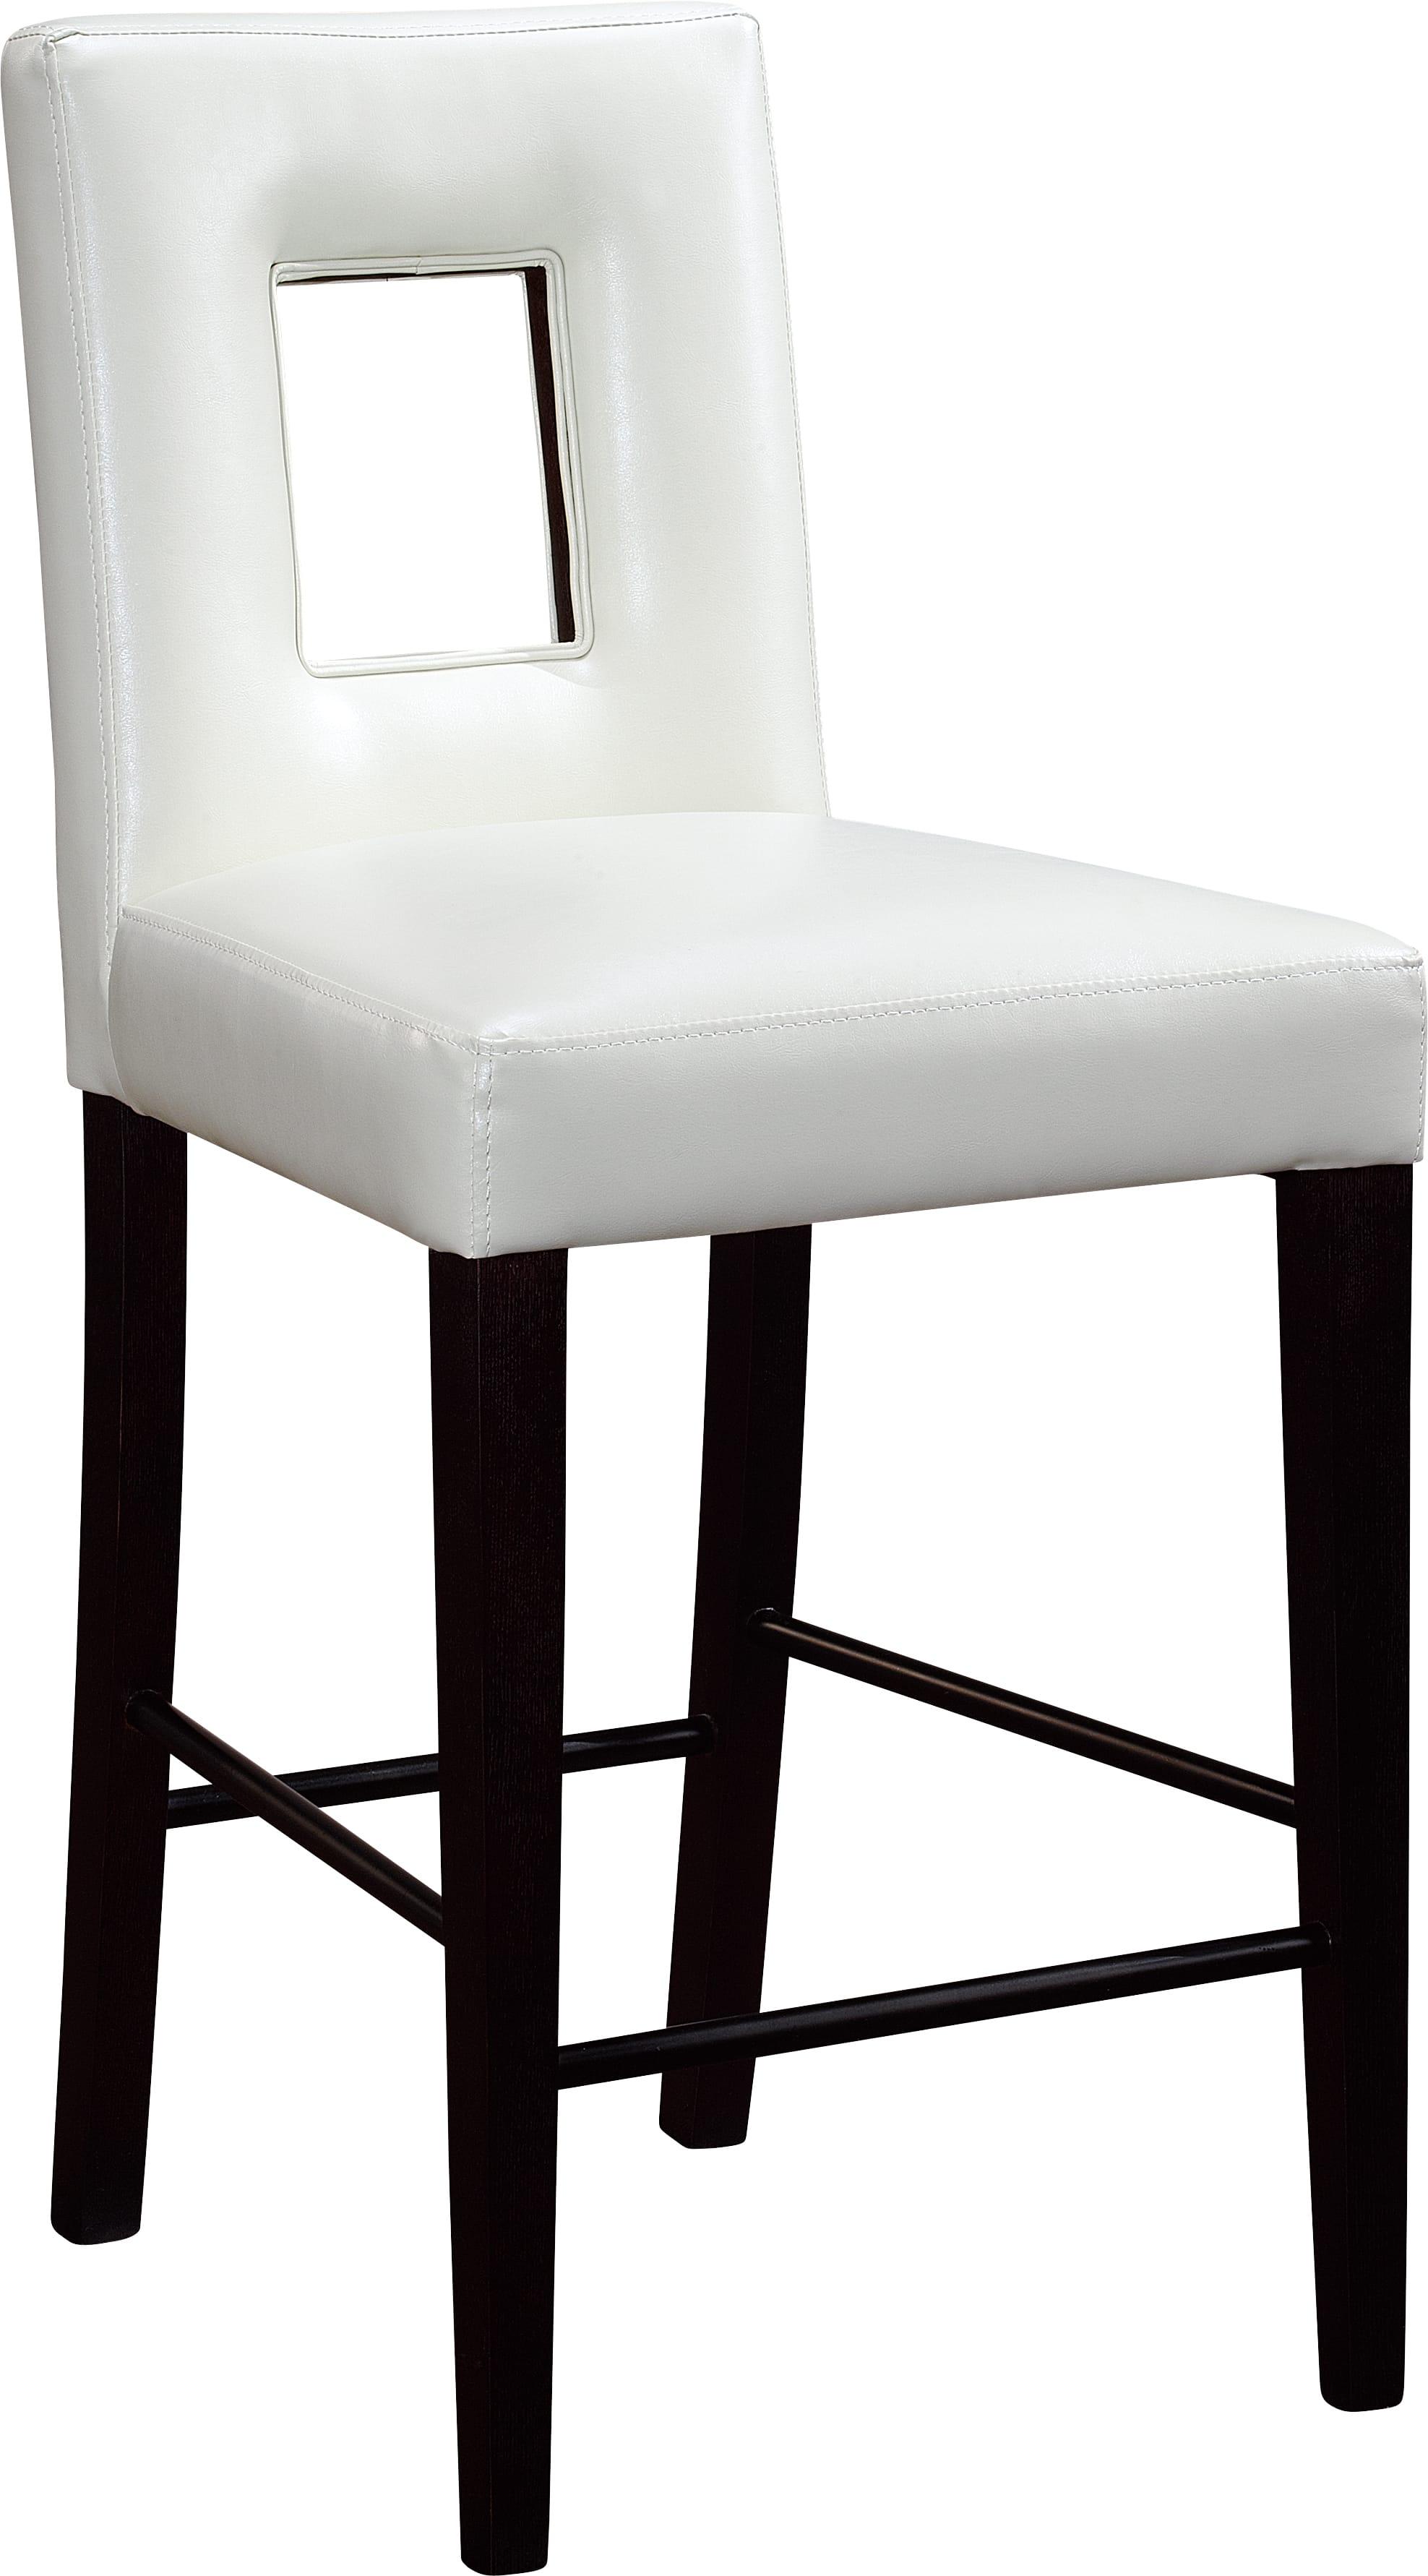 Bar Stool Dg072 Beige Set Of 2 By Global Furniture